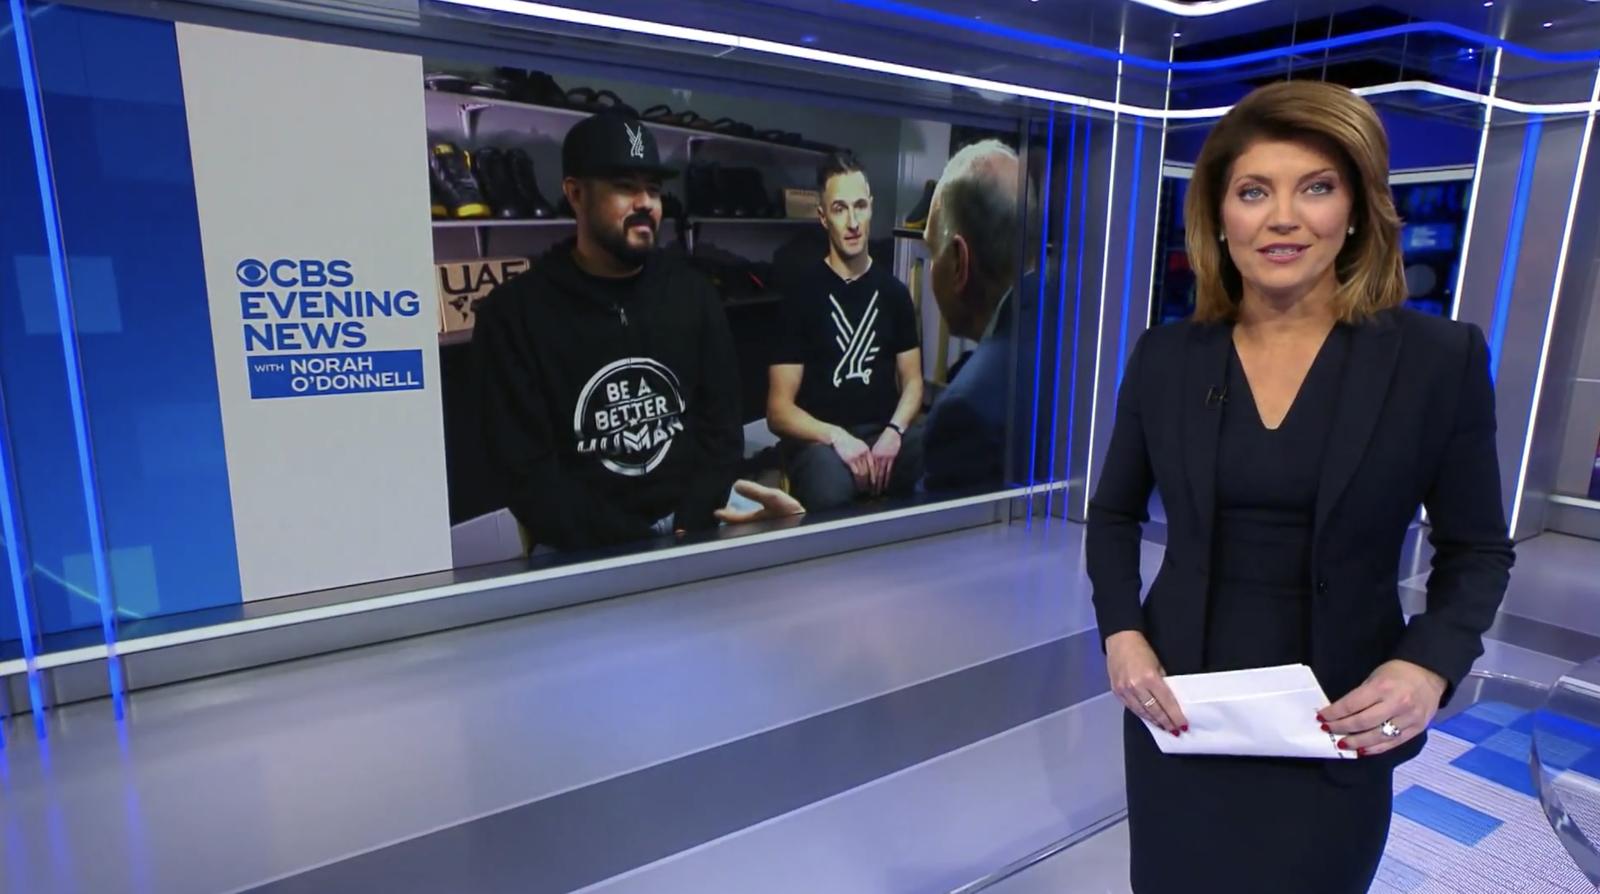 NCS_CBS-Evening-News_Motion-Design_Washington_002